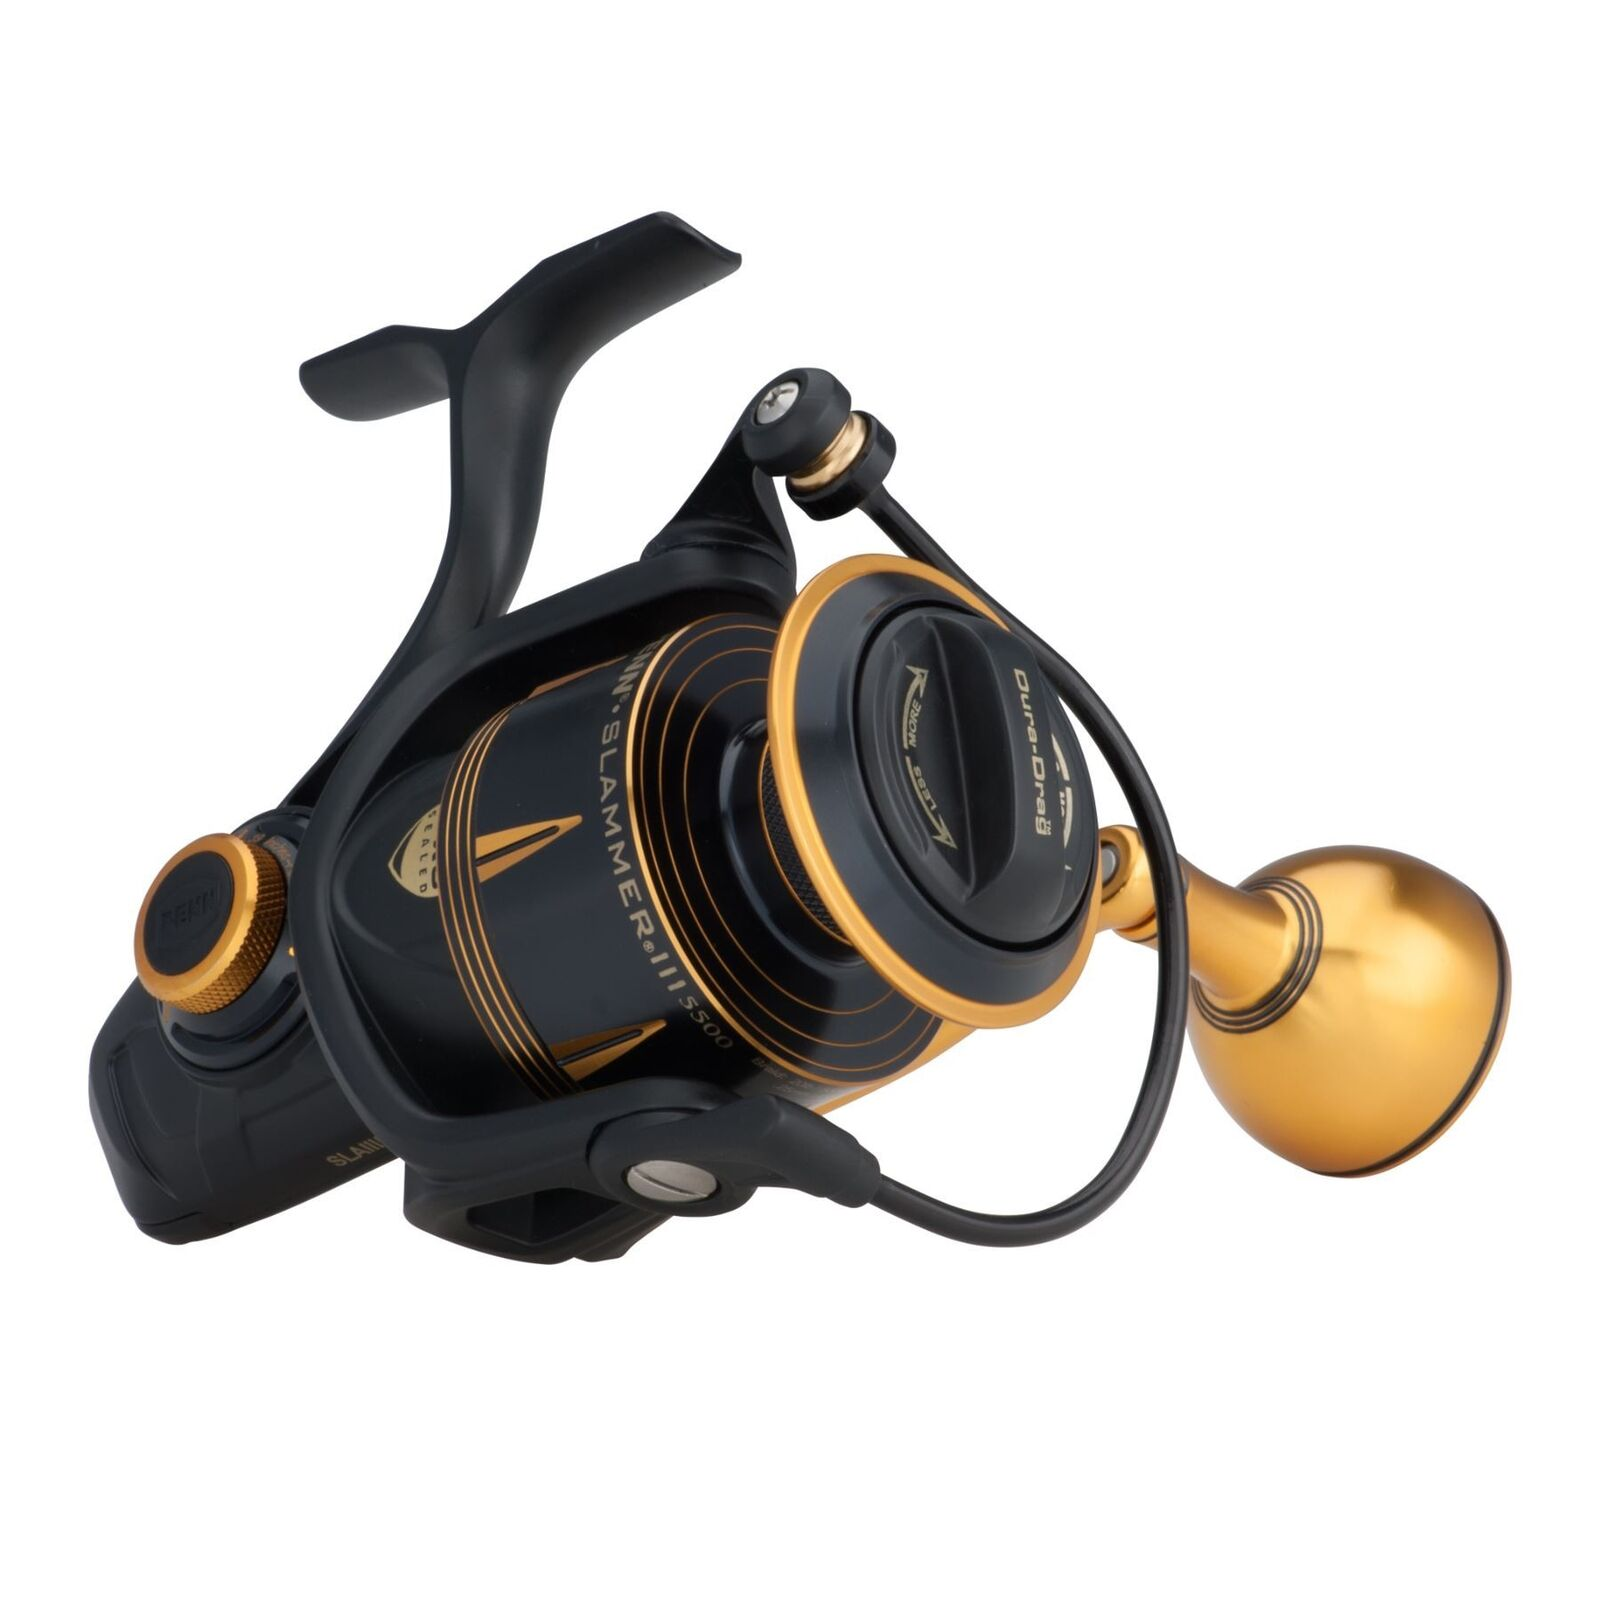 Penn Slammer III 9500  Resistente Mulinello per Pesca Spinning